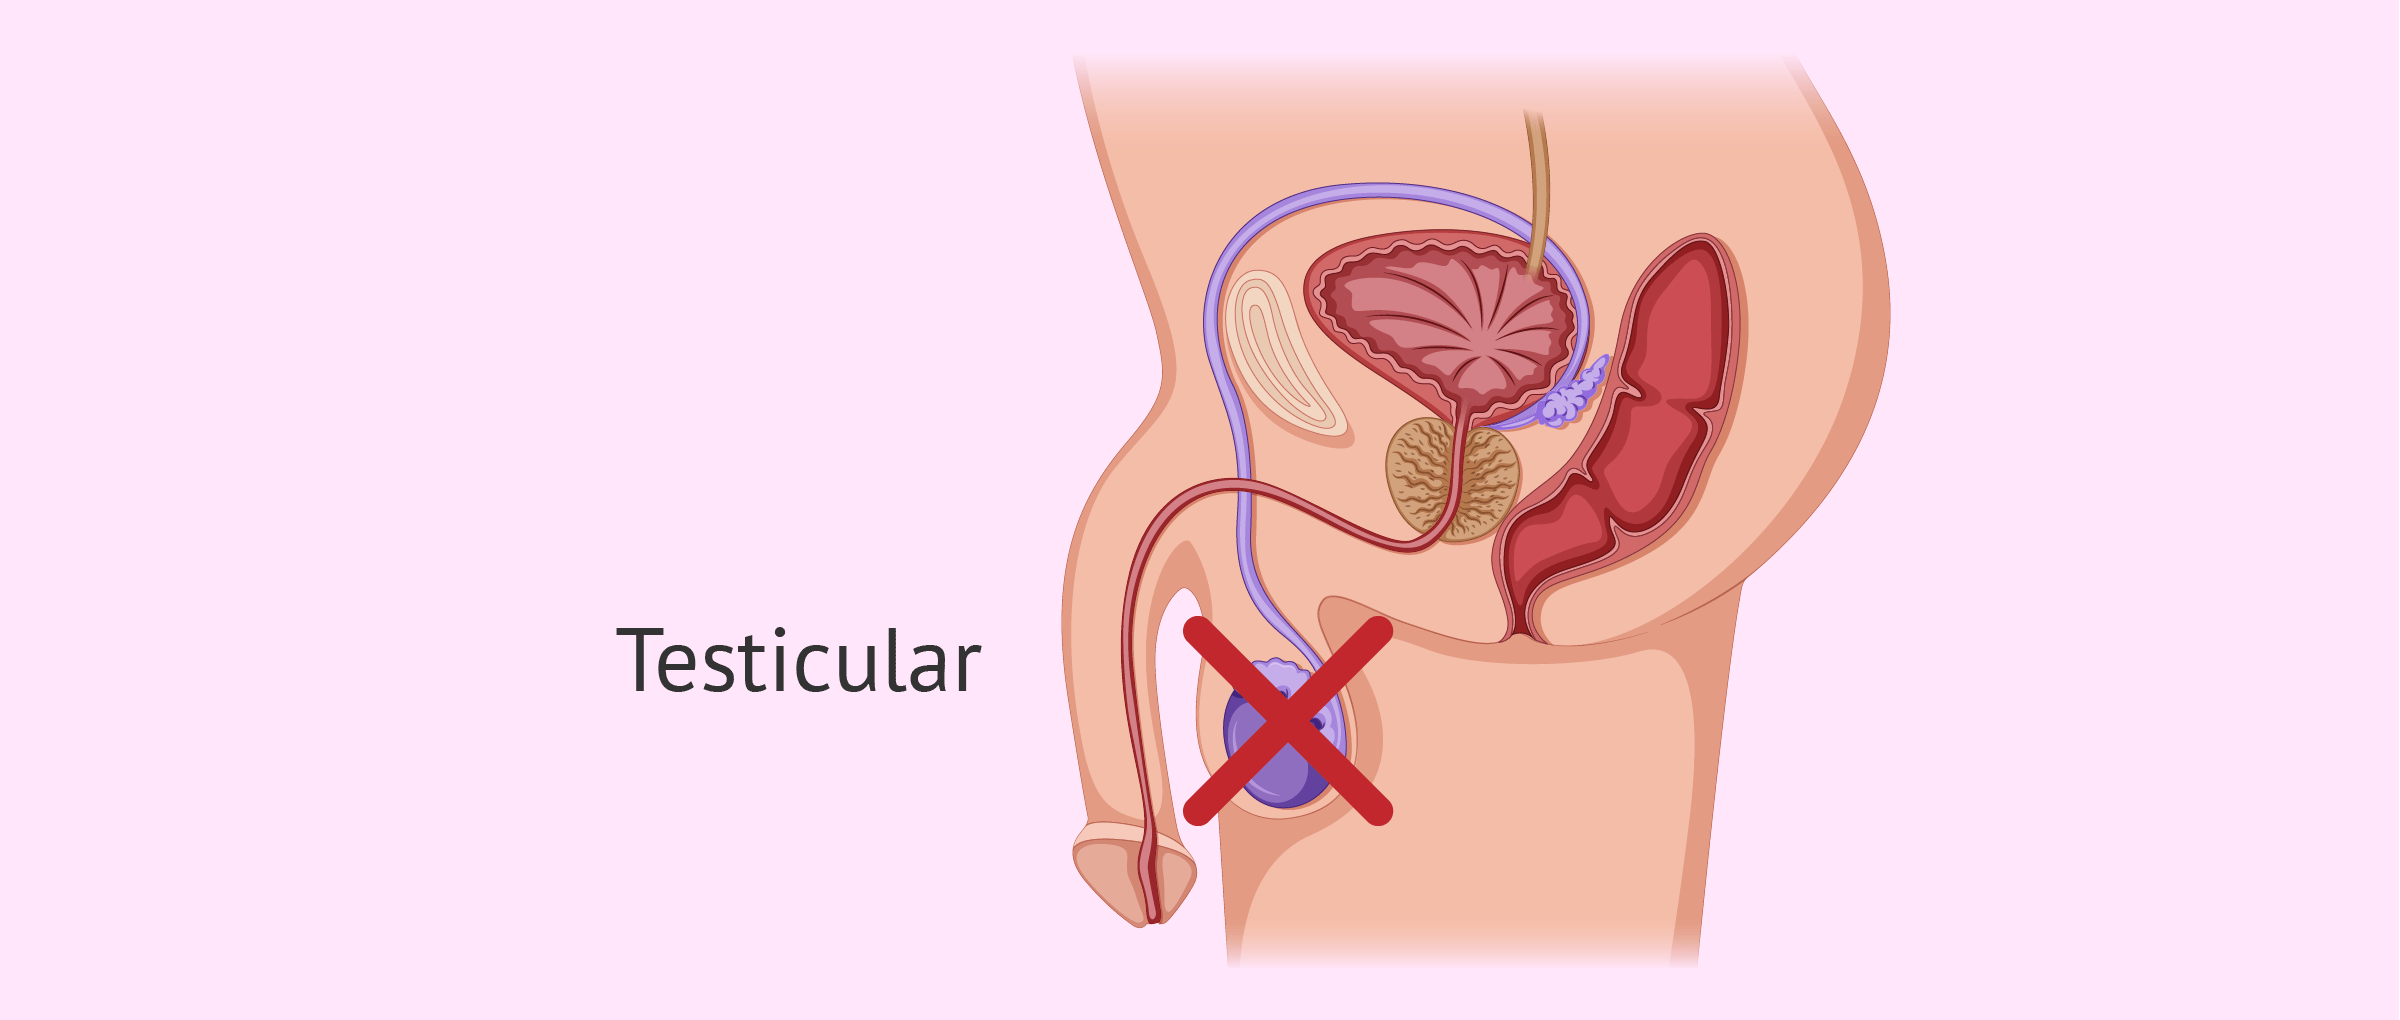 Azoospermia due to testicular causes